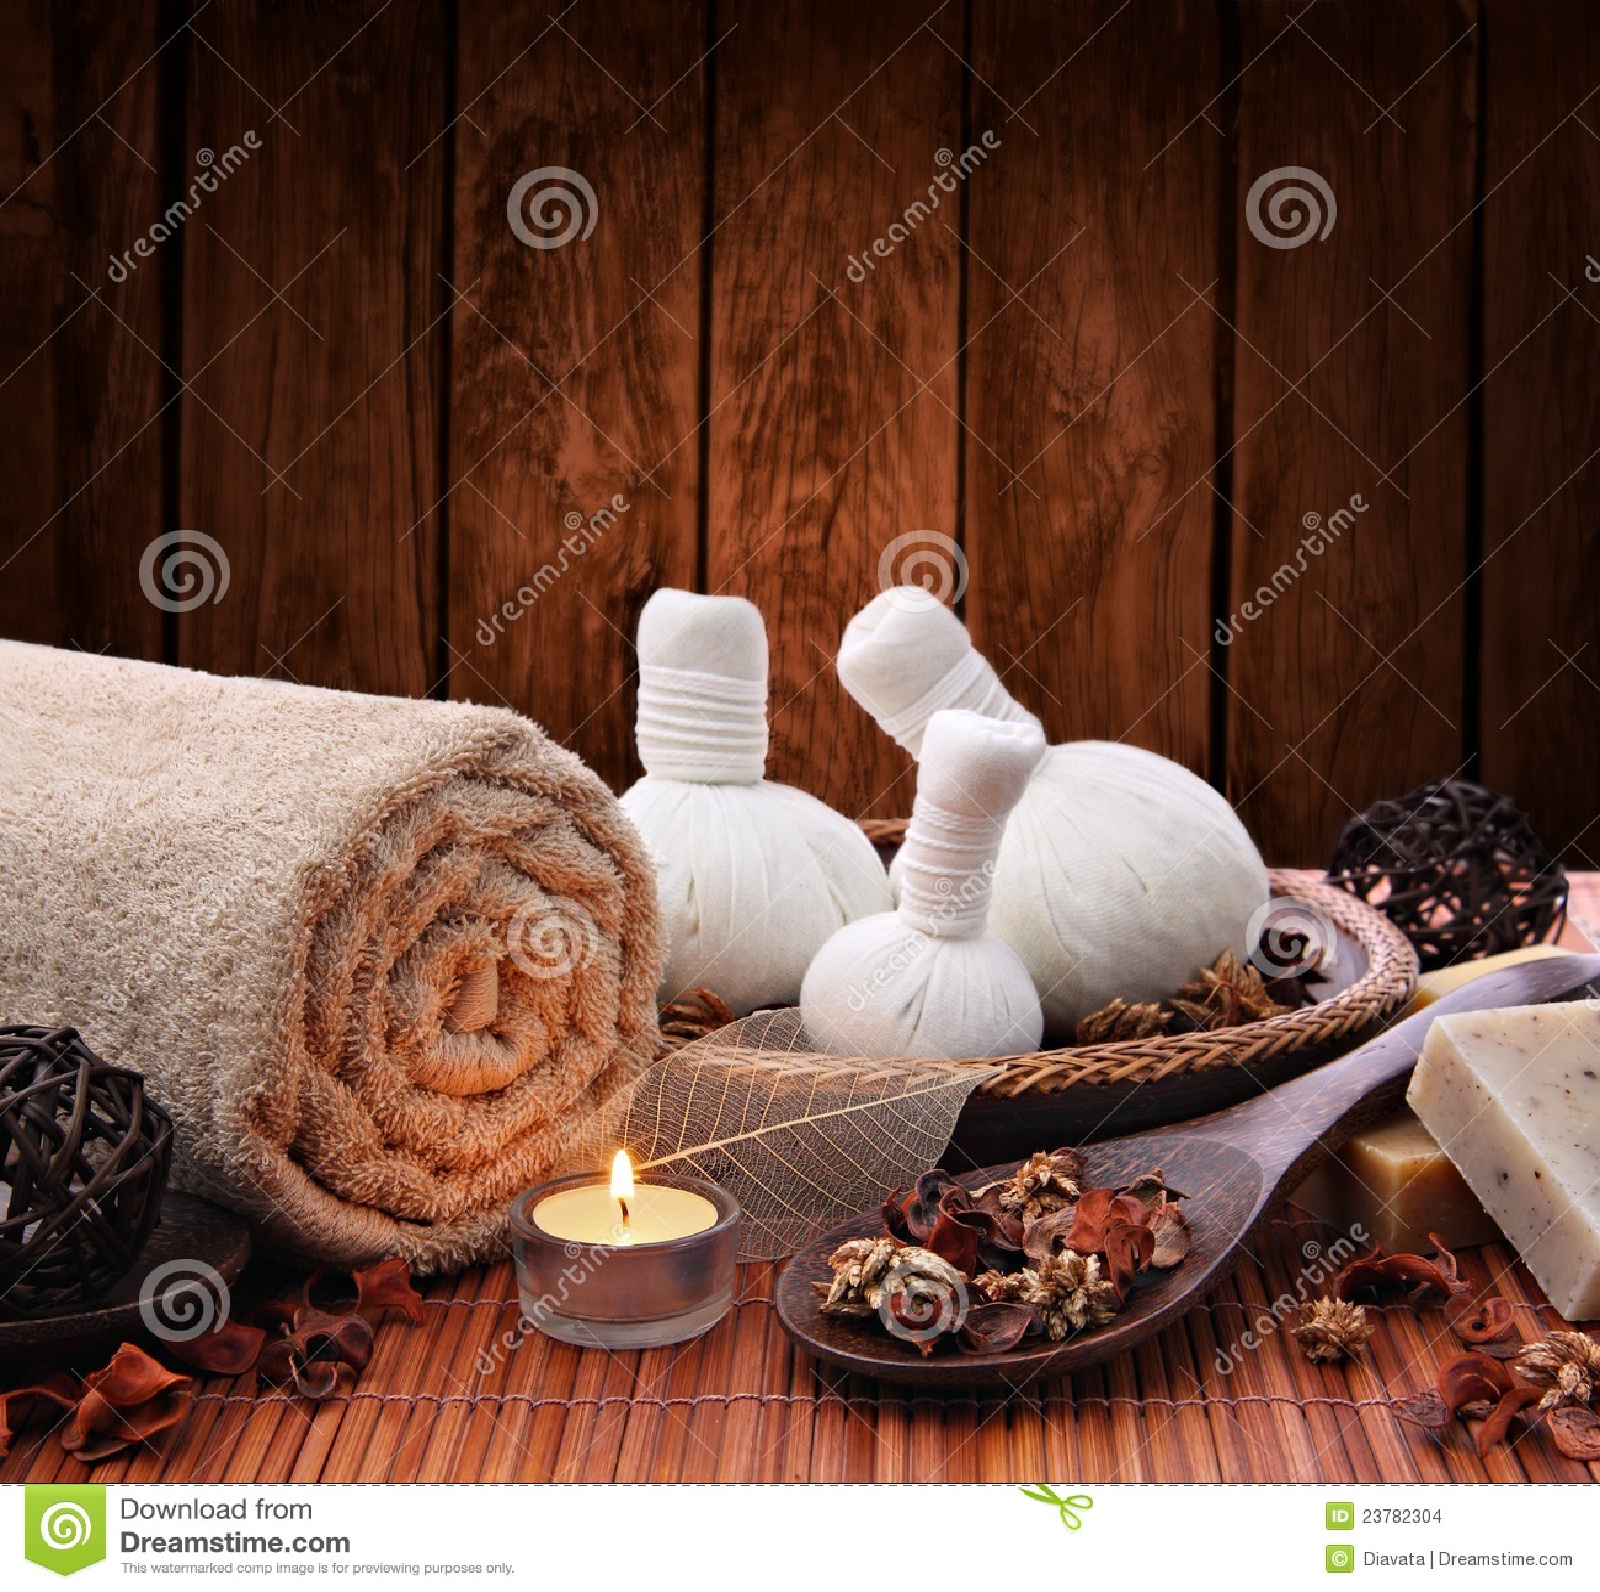 Spa massage setting with candlelight